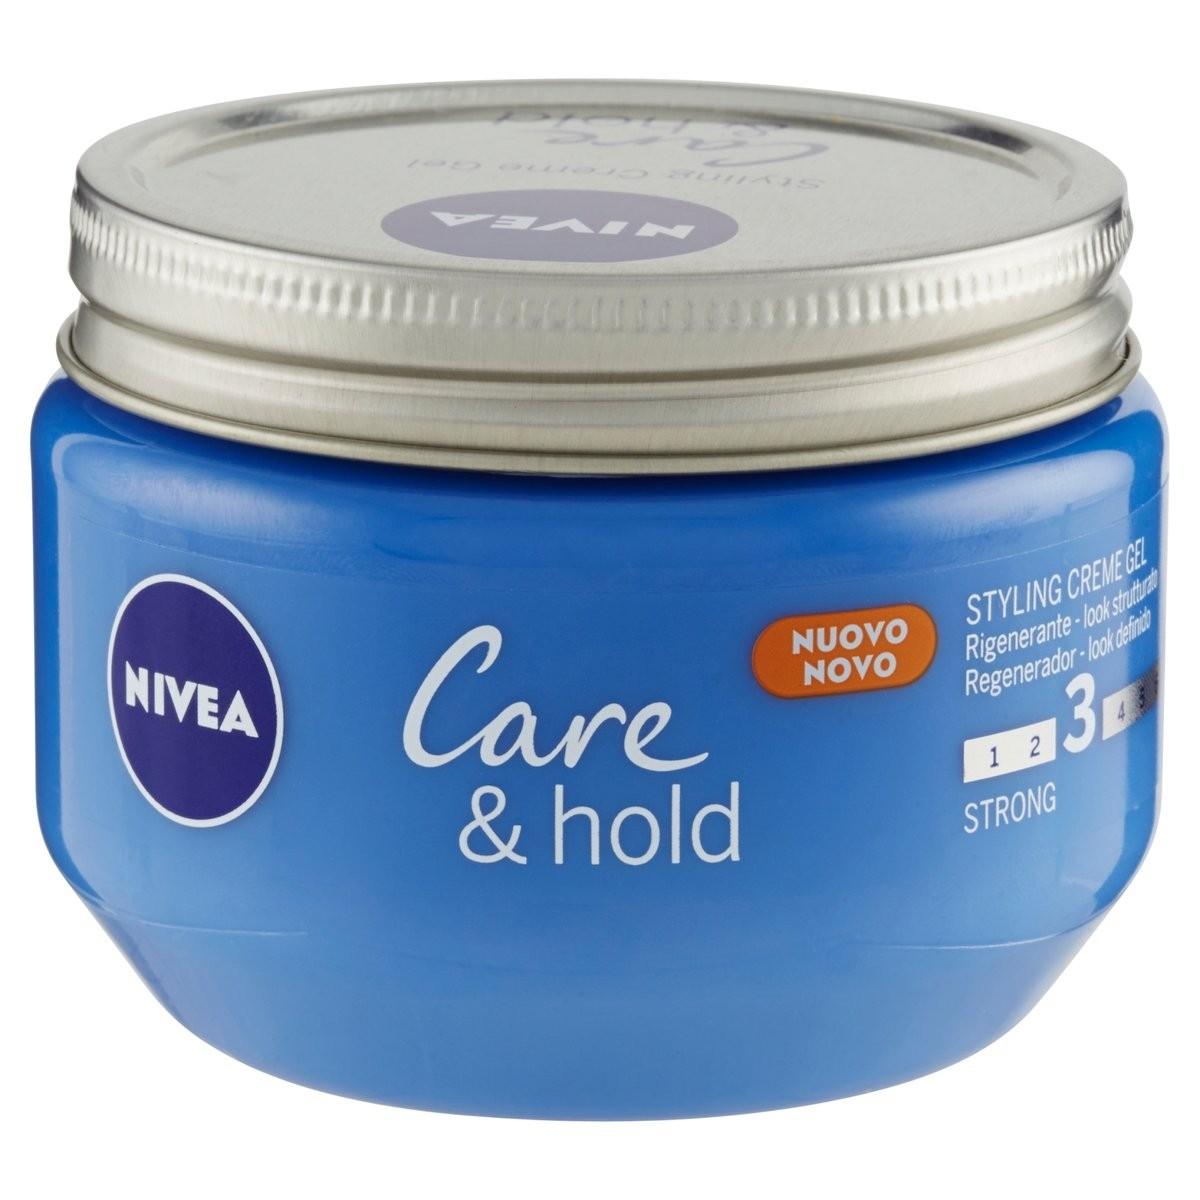 Nivea Styling Cream Creme Gel